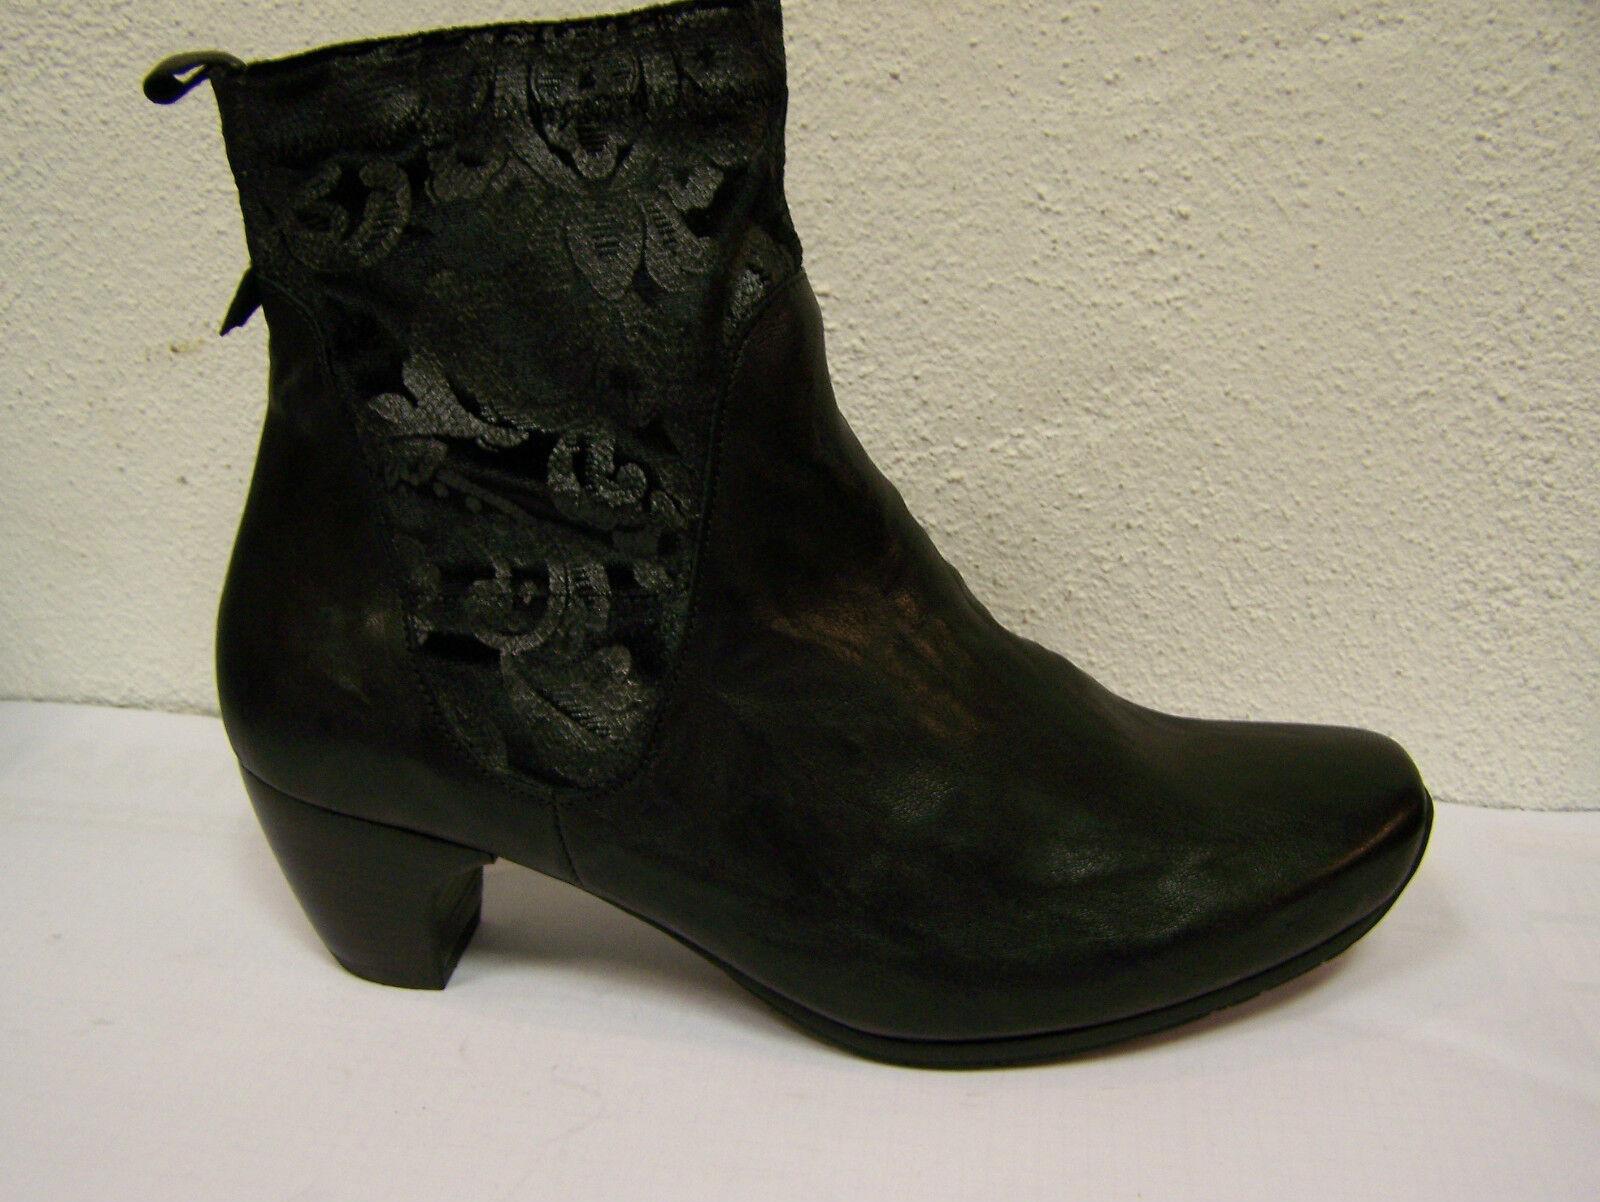 Think zapatos botas negro ana Capra rustico textil, cuero forraje think bolsa